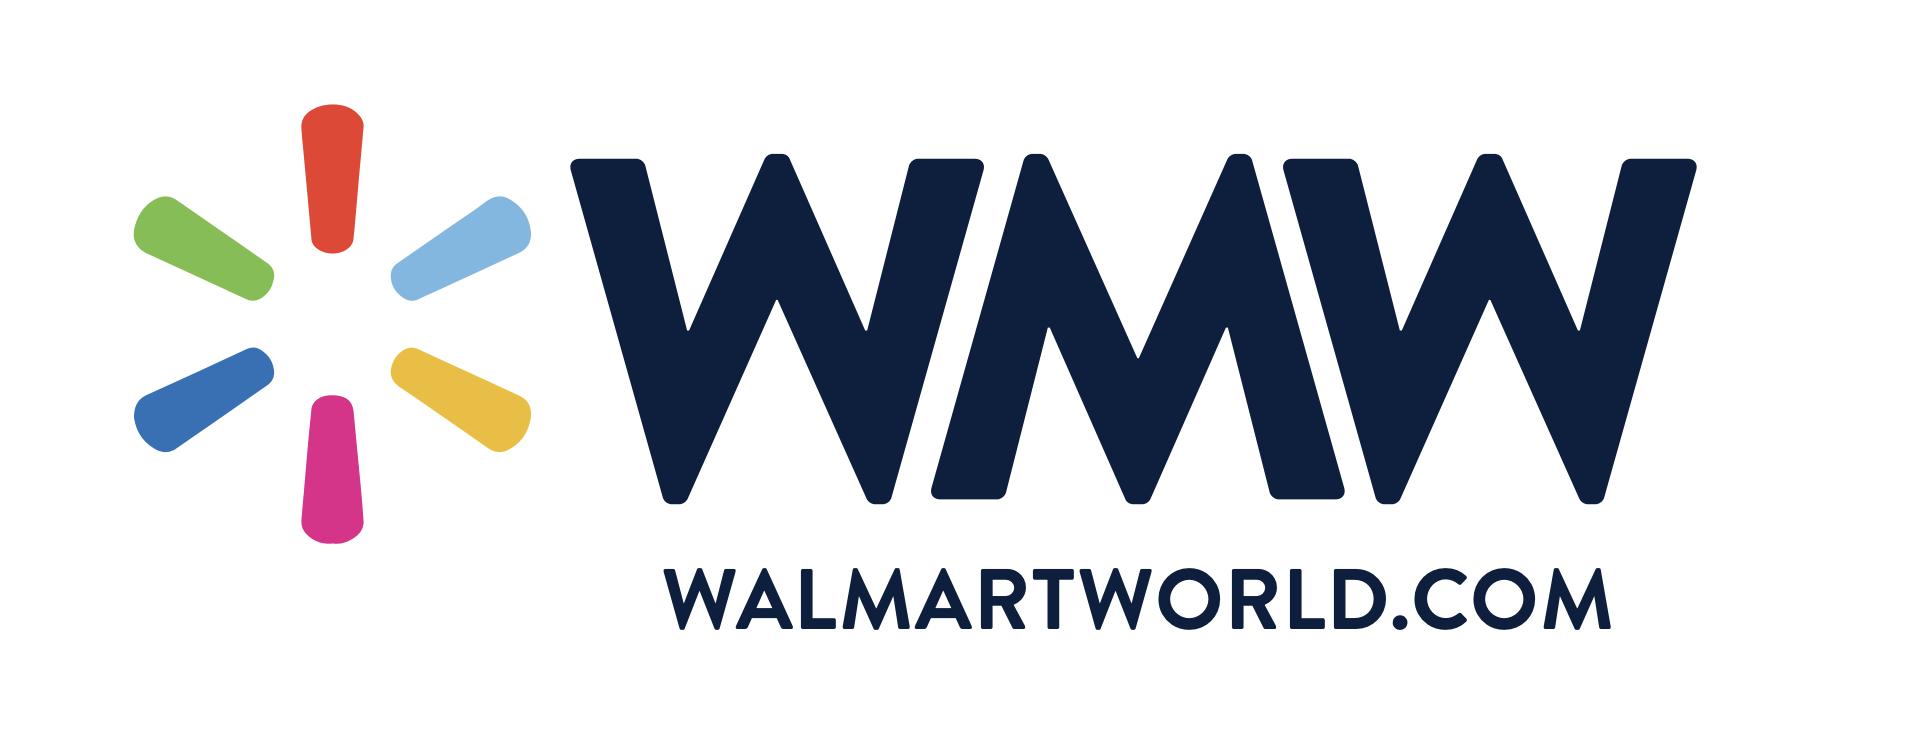 Walmart World